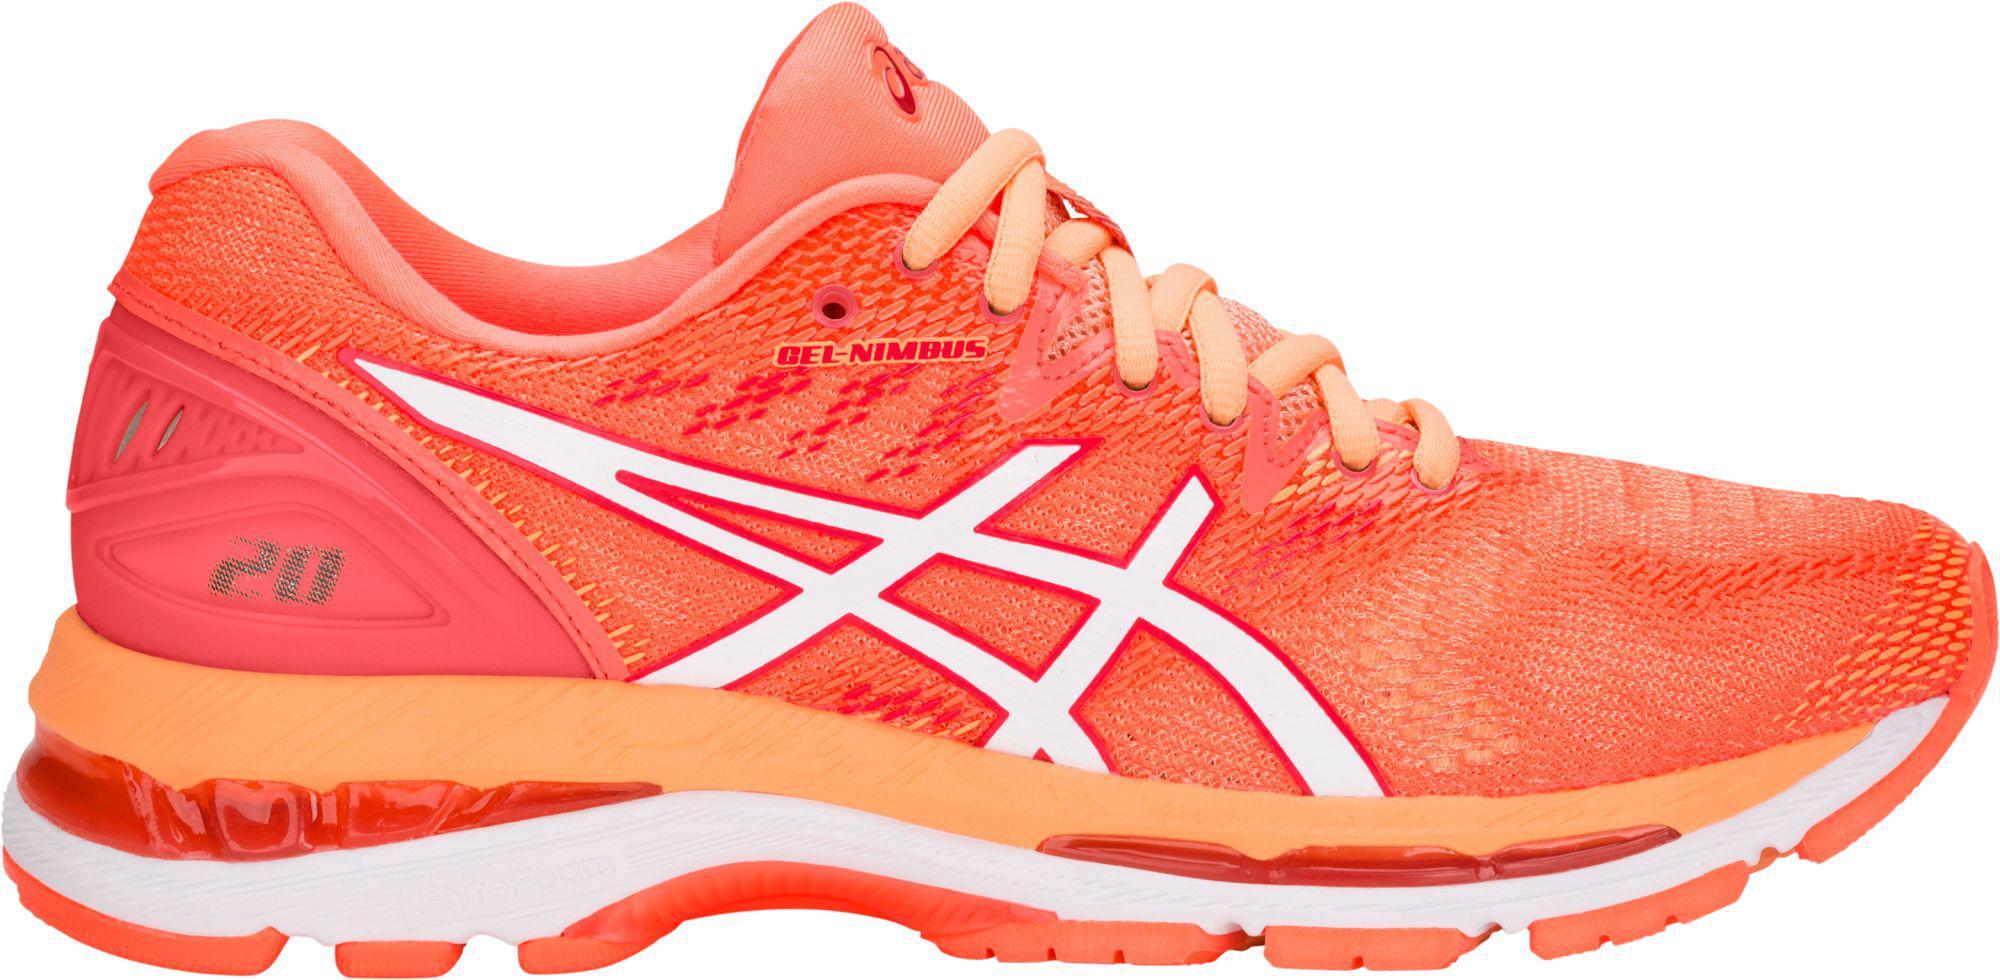 de676a4af8a Asics Orange Gel-nimbus 20 Running Shoes